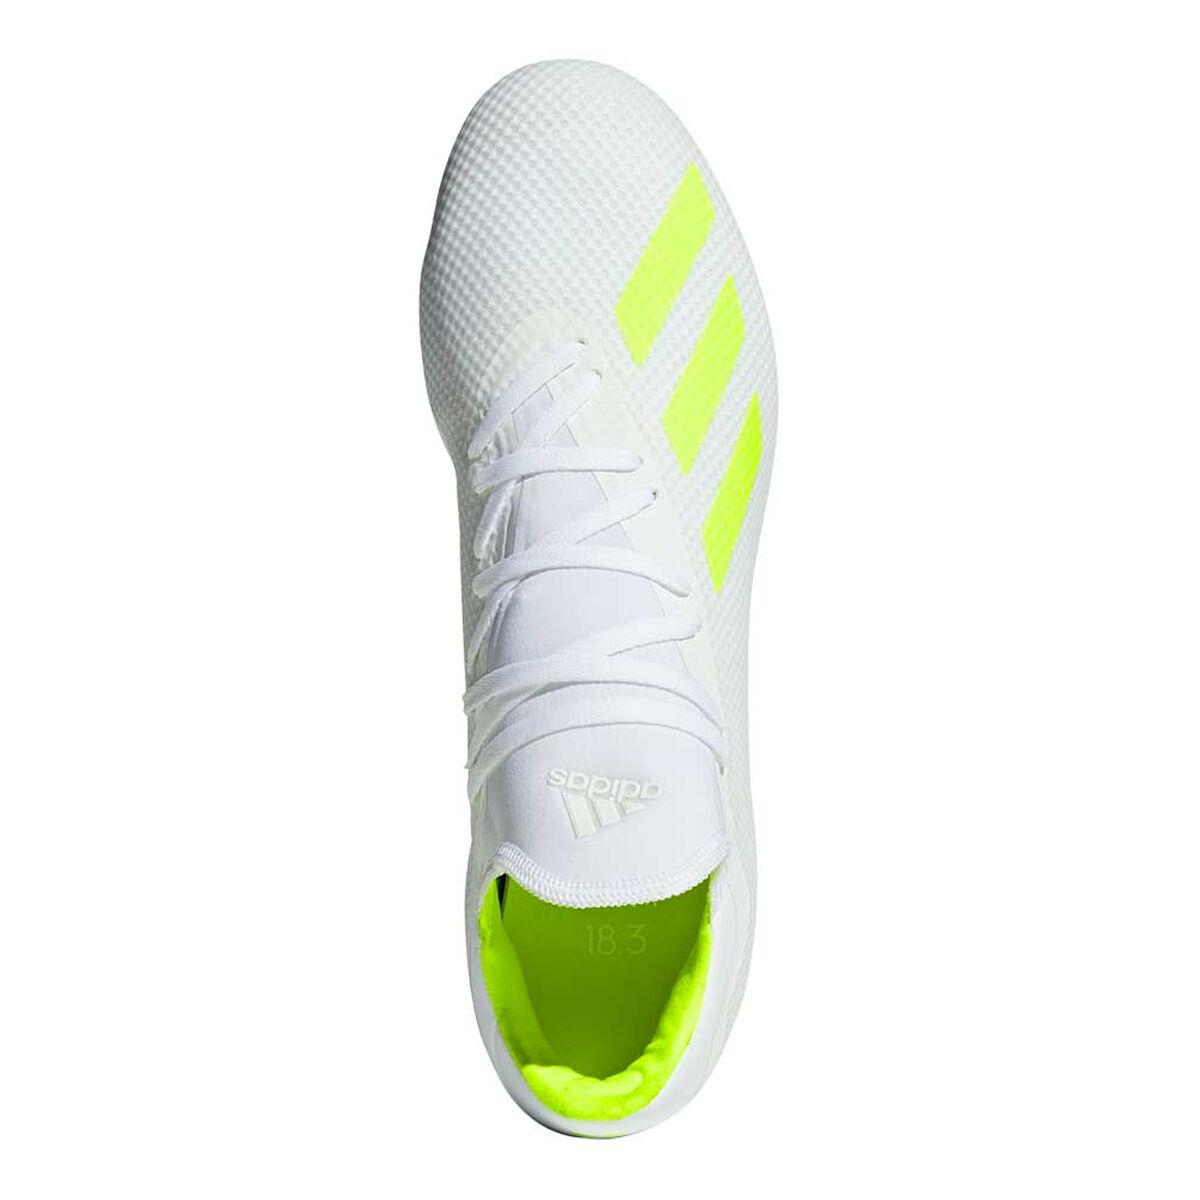 adidas X 18.3 Football Boots White Yellow US Mens 8 Womens 9